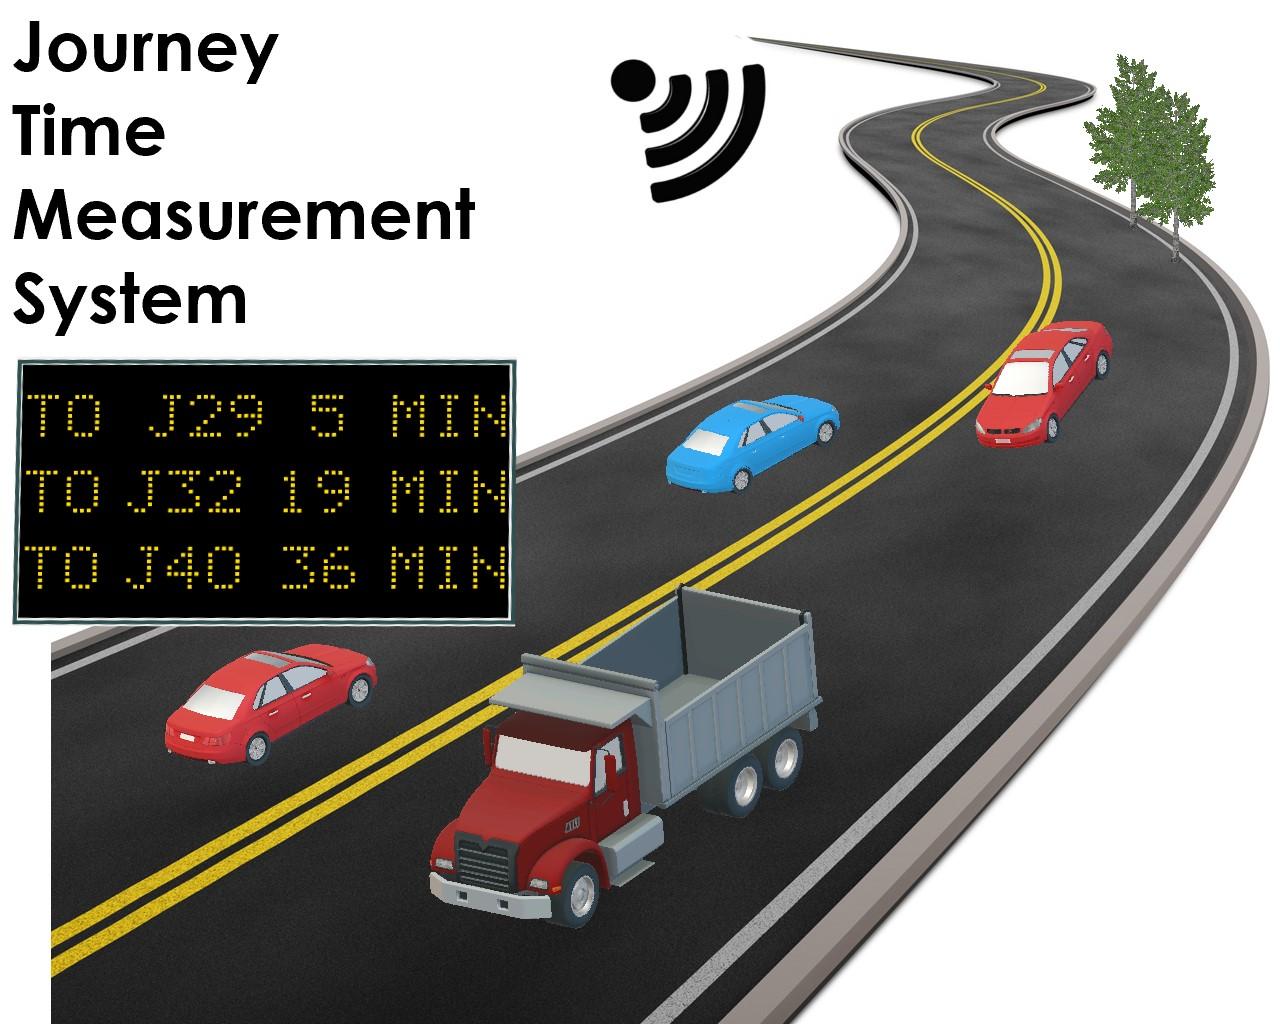 Journey time measurement system